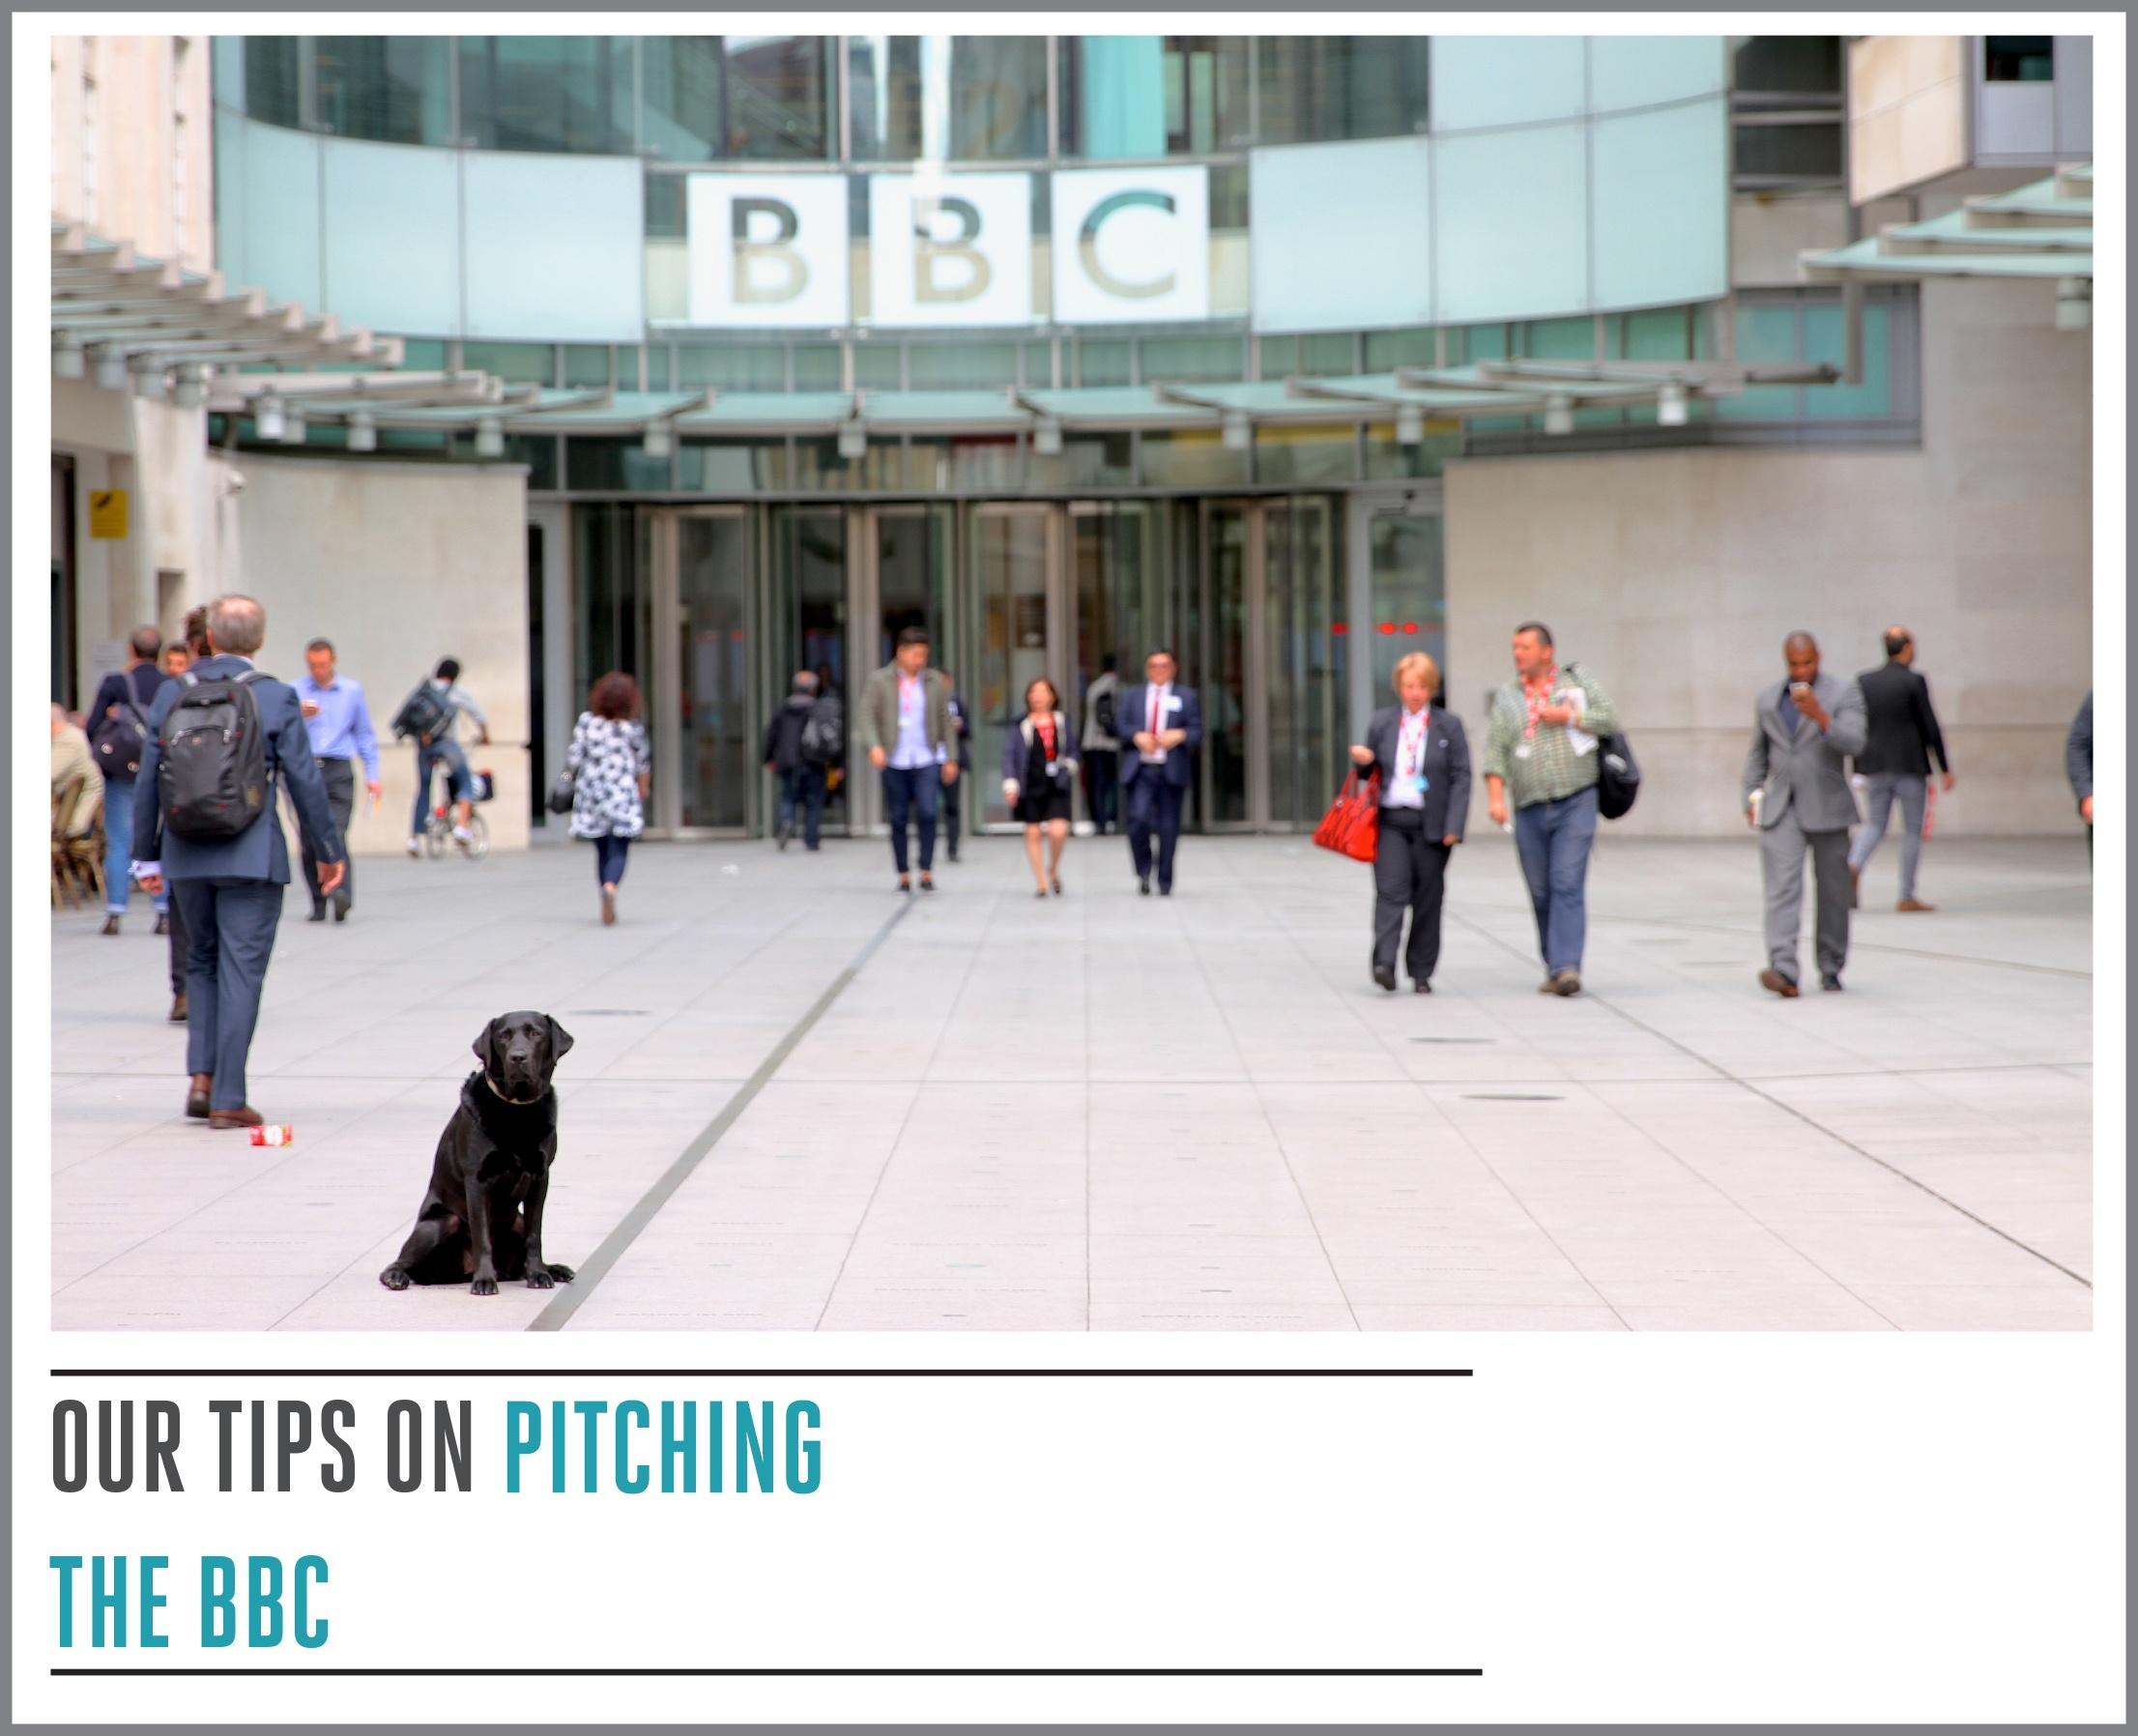 bbc_new.jpg